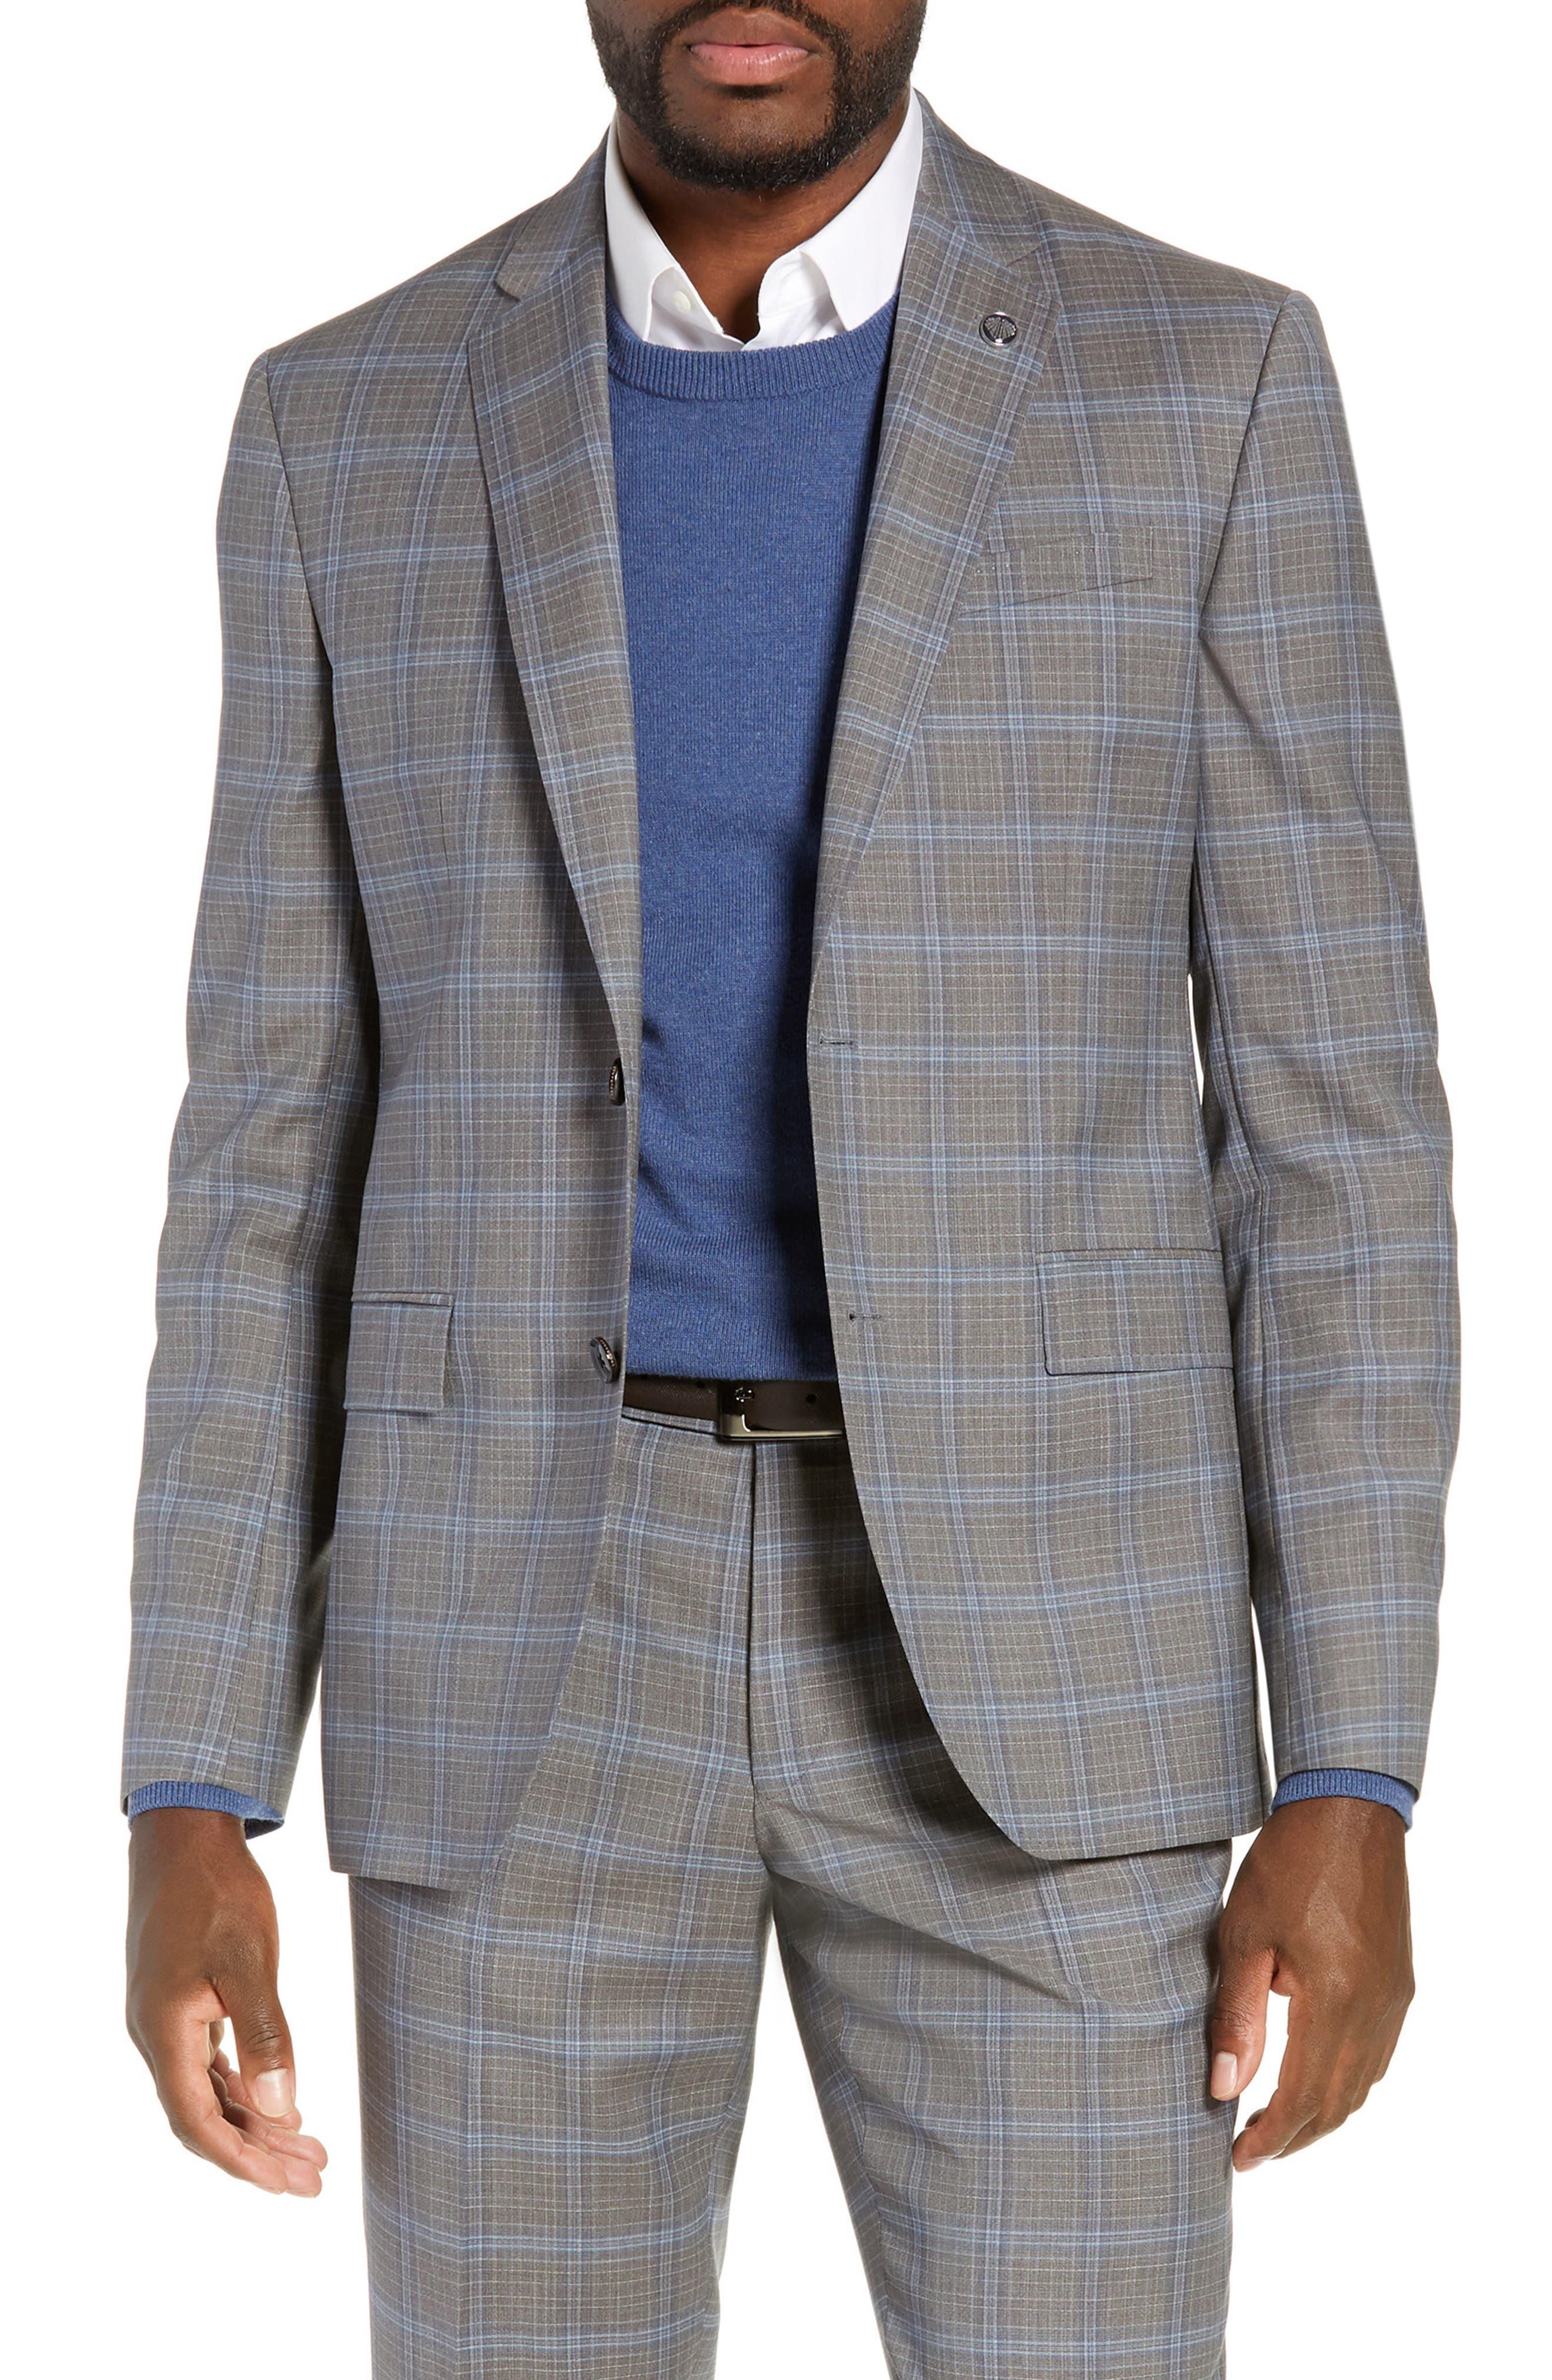 TED BAKER LONDON, Jay Trim Fit Plaid Wool Suit, Alternate thumbnail 5, color, LIGHT GREY